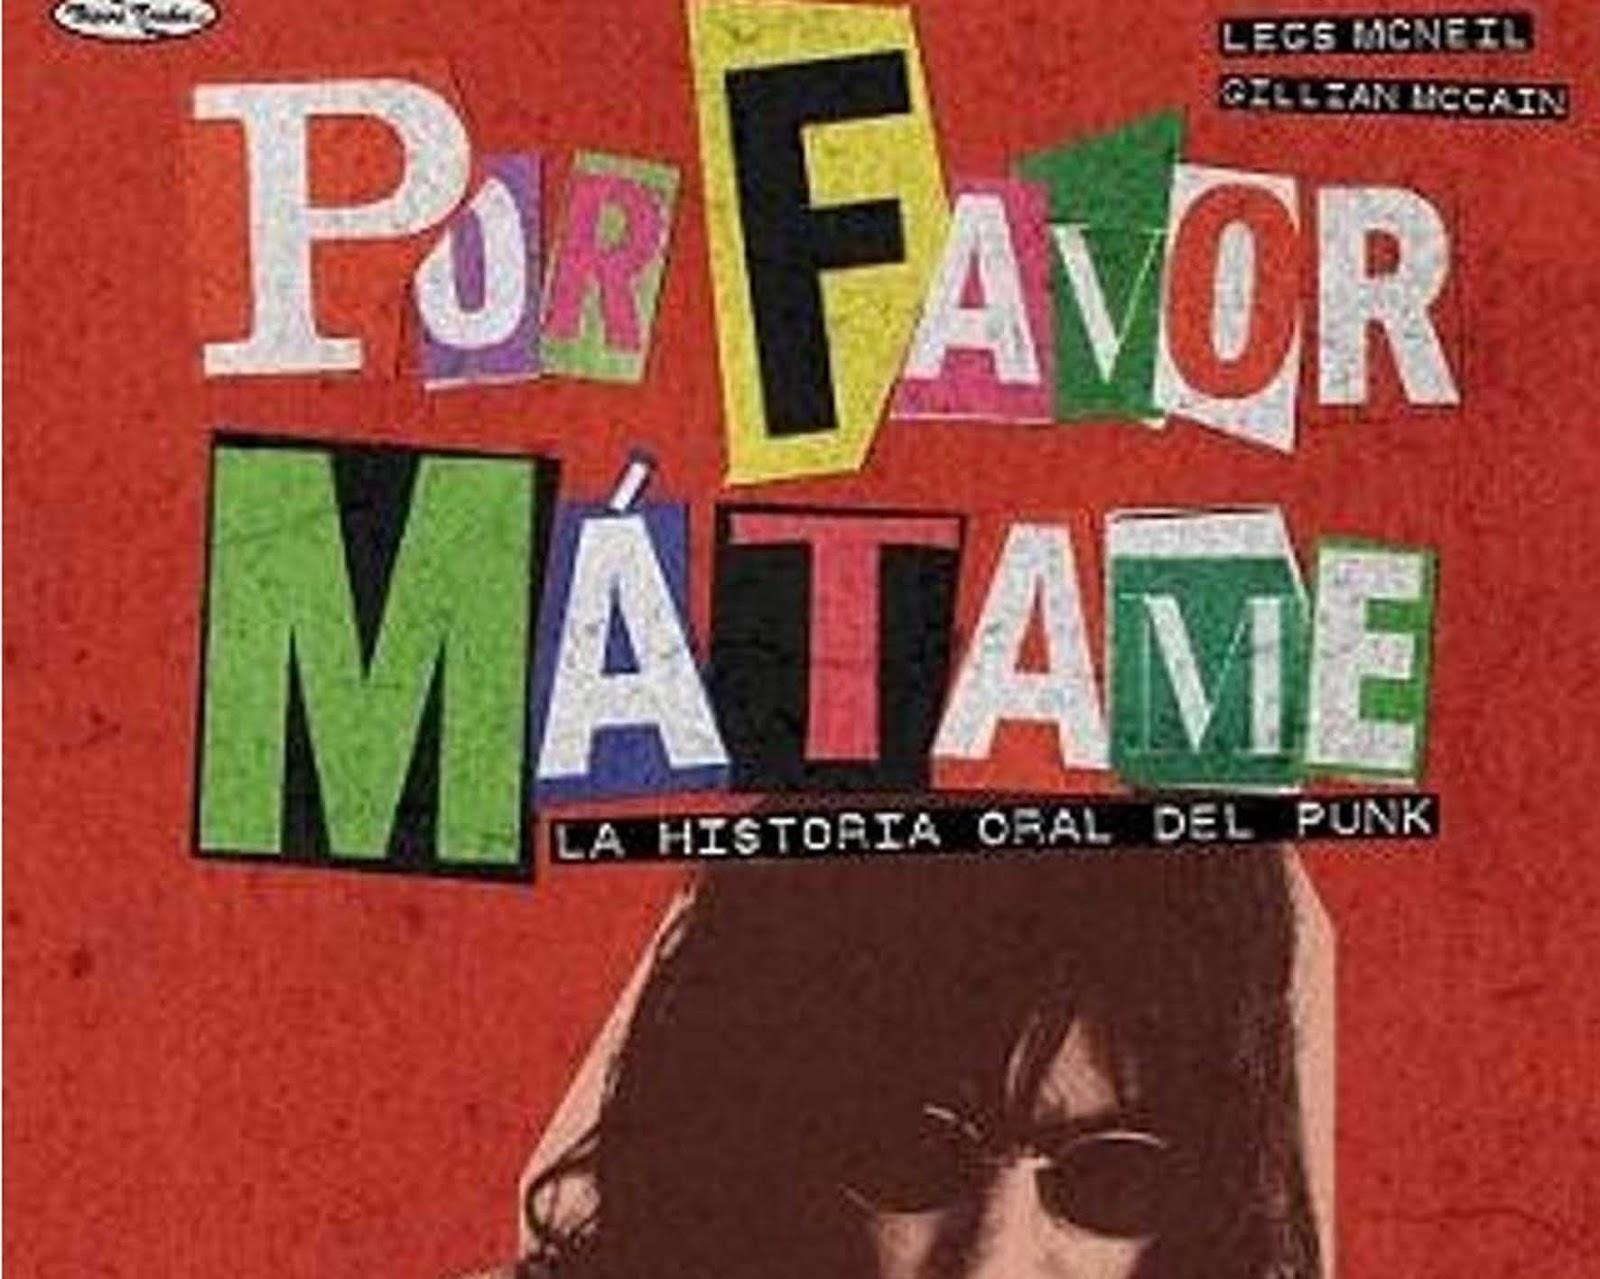 Matame 1920 Full Length Movies Flowerinternet